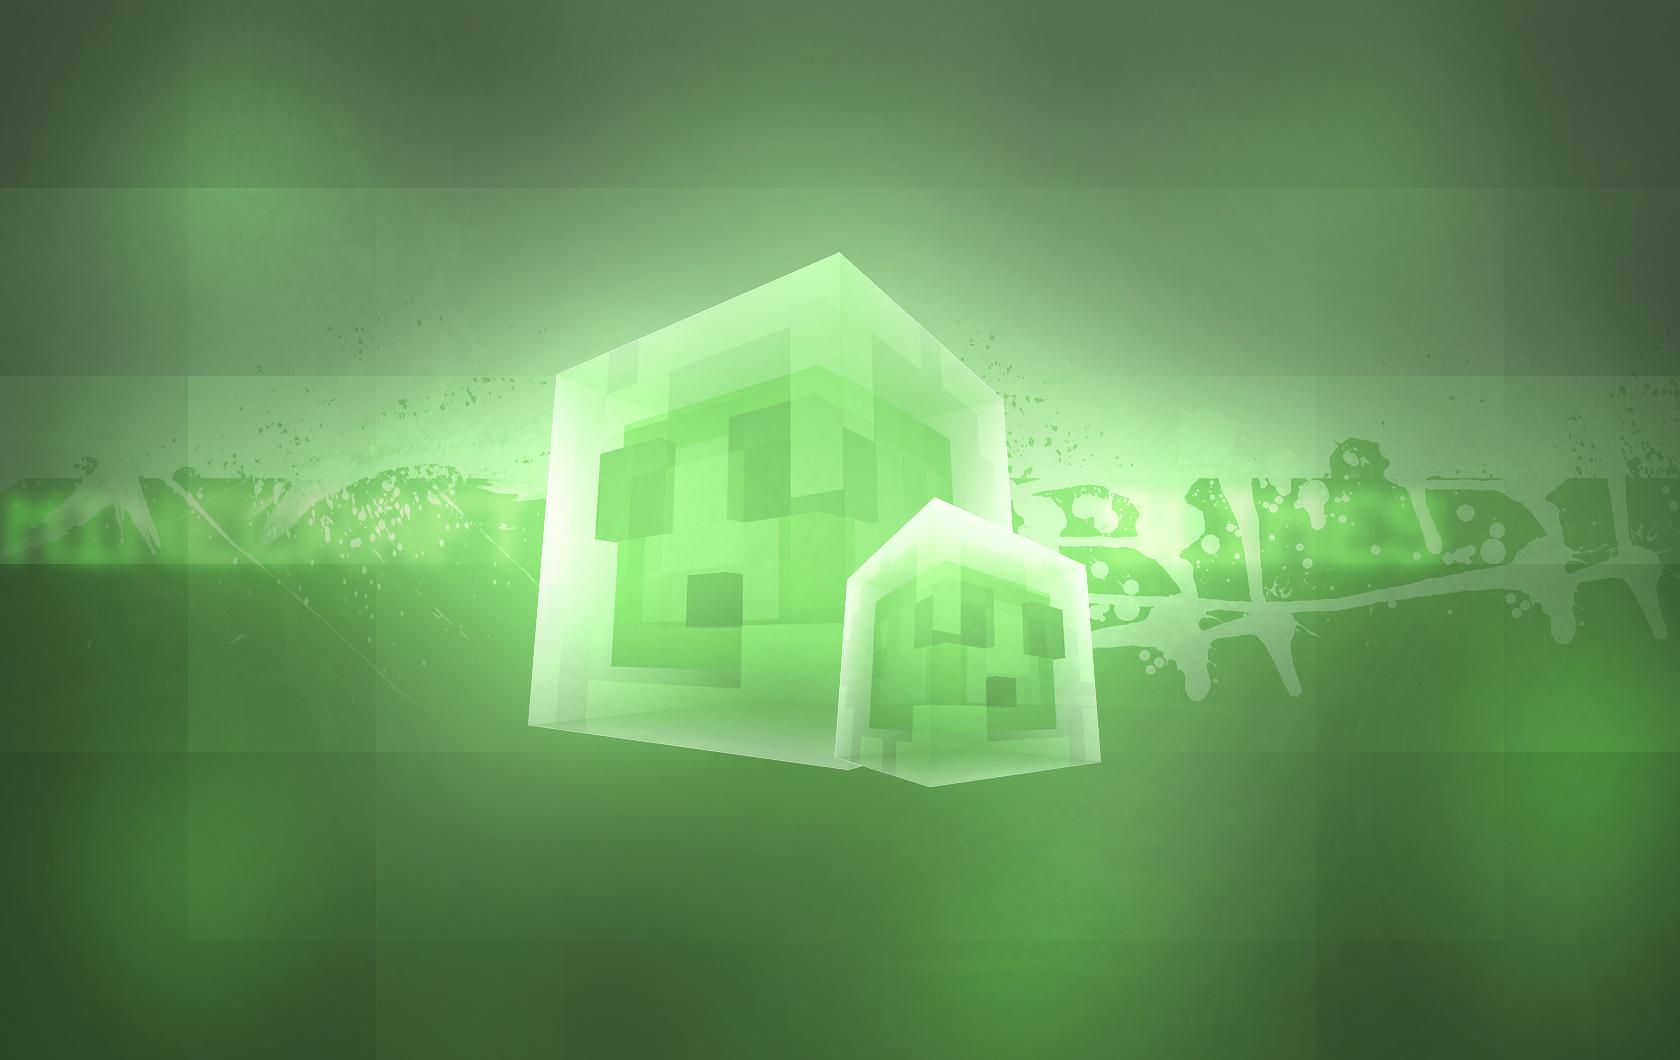 Minecraft 'Slimes' wallpaper